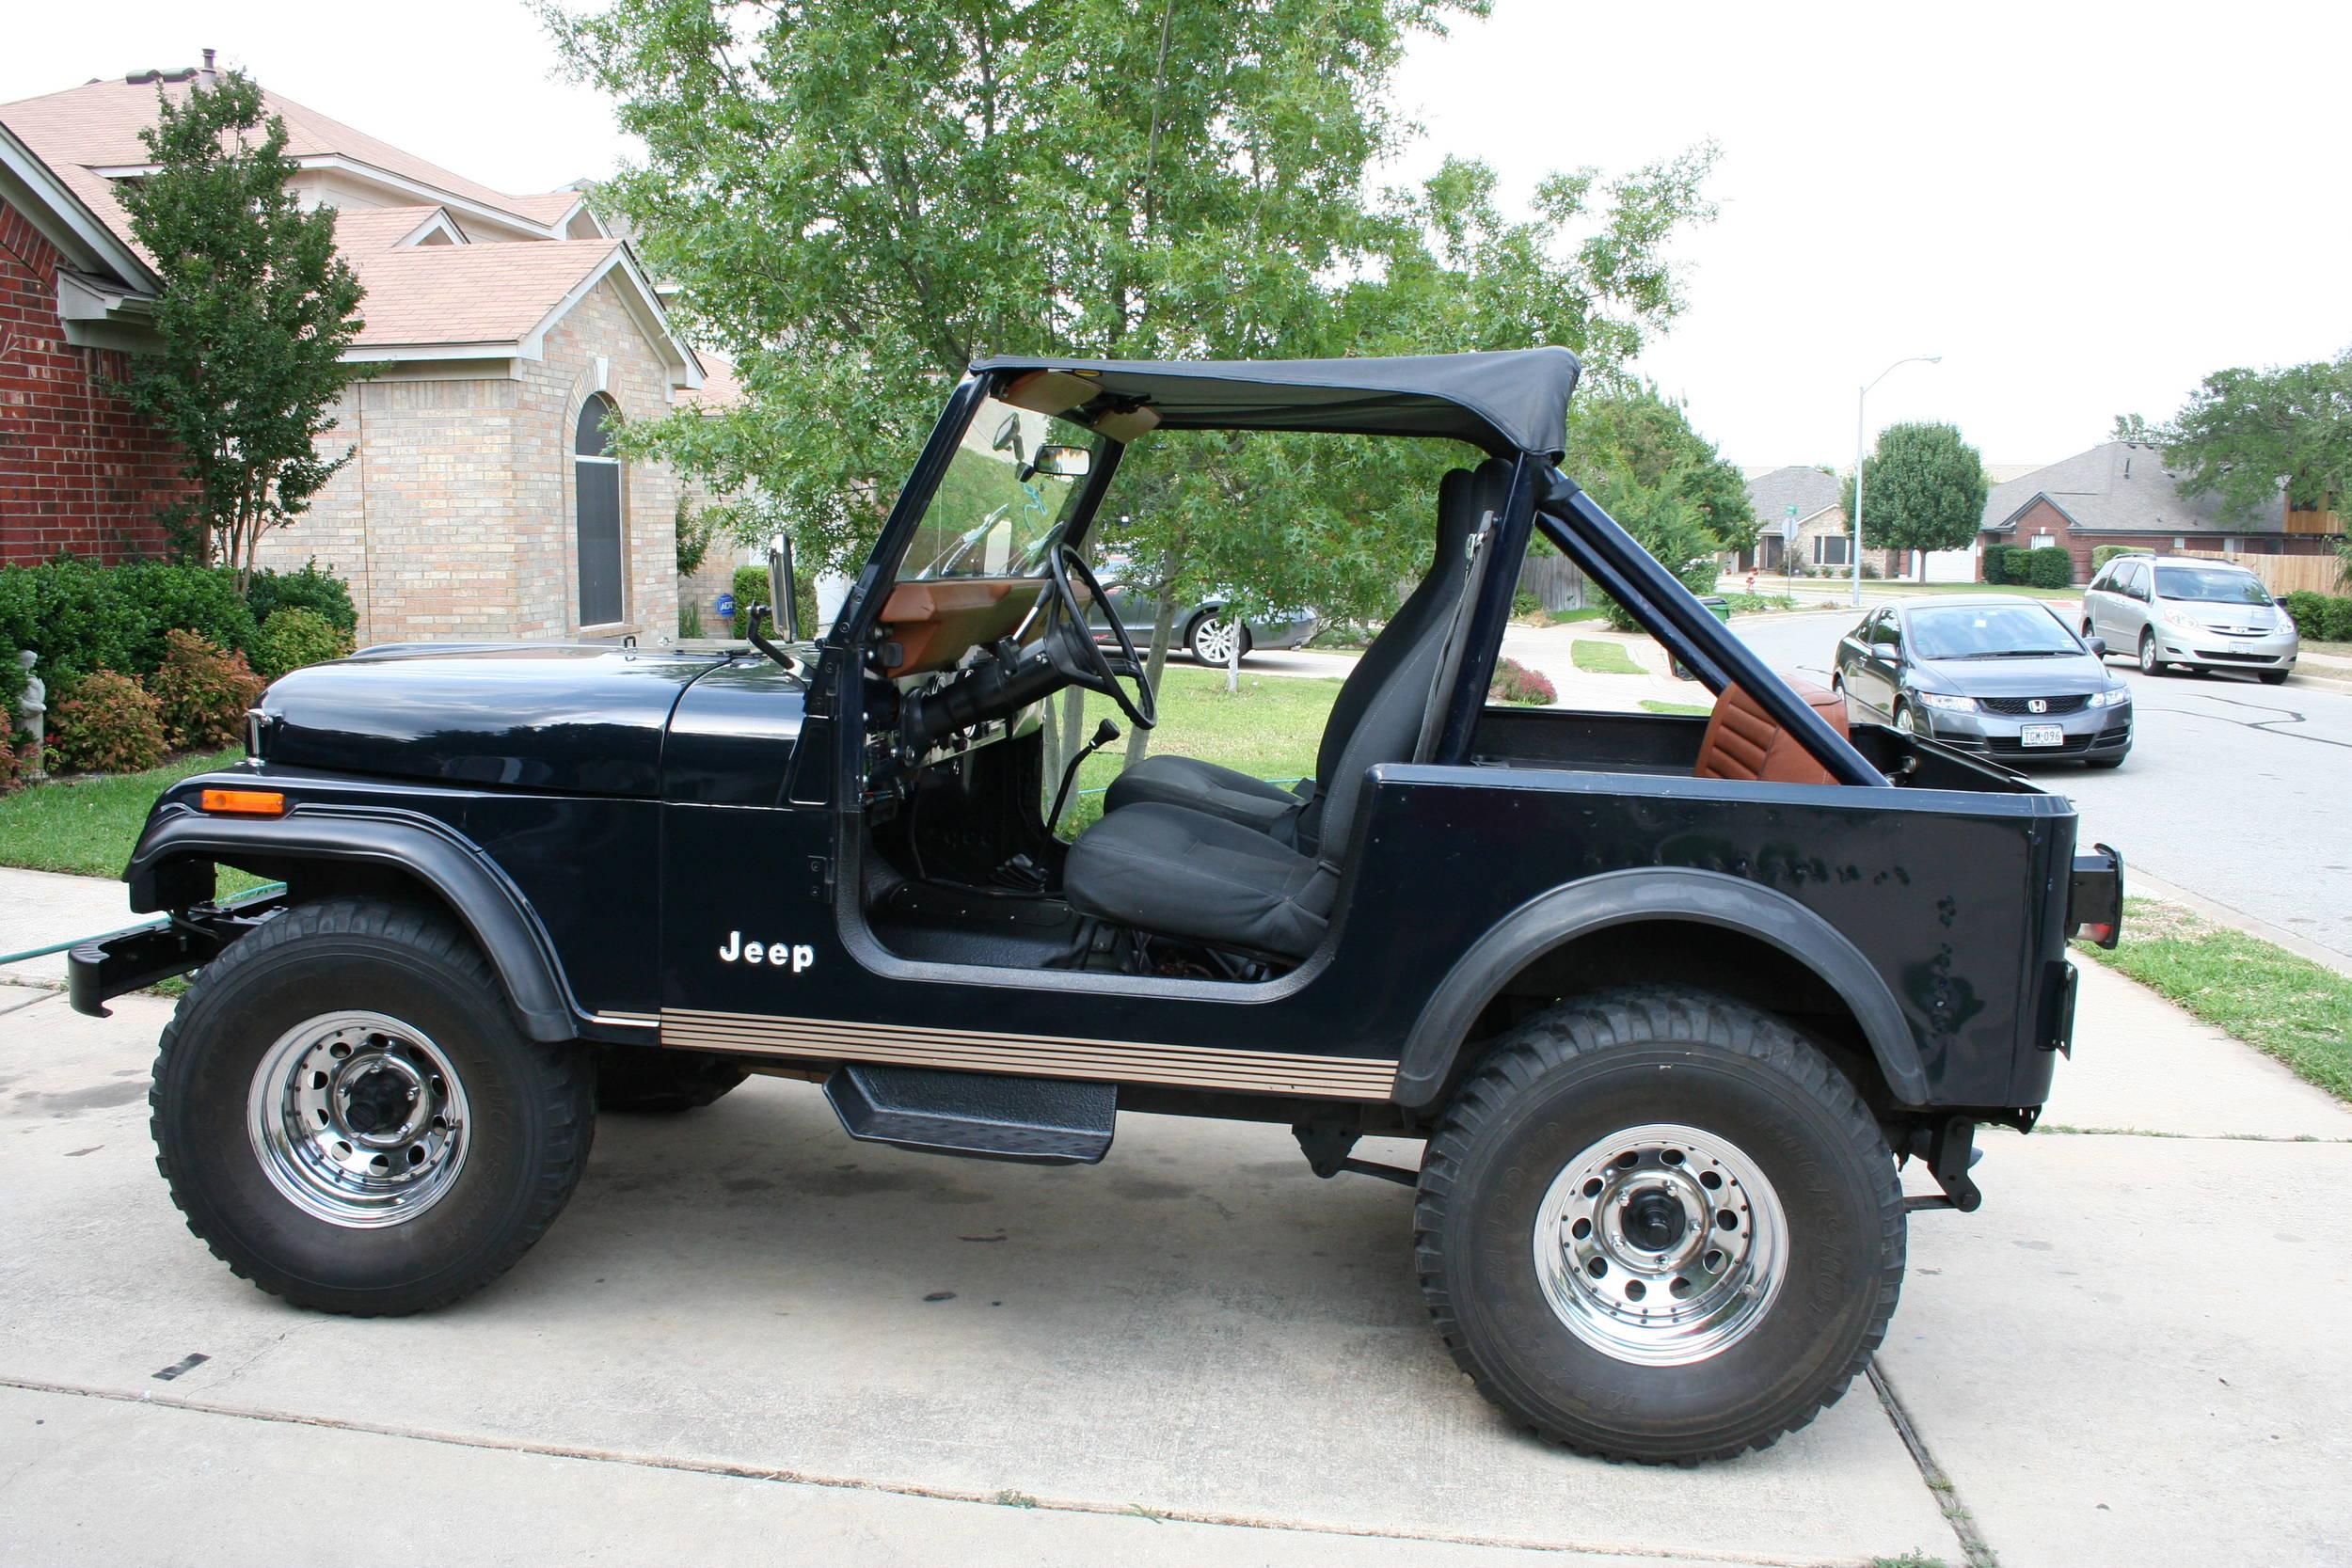 whole_jeep.JPG